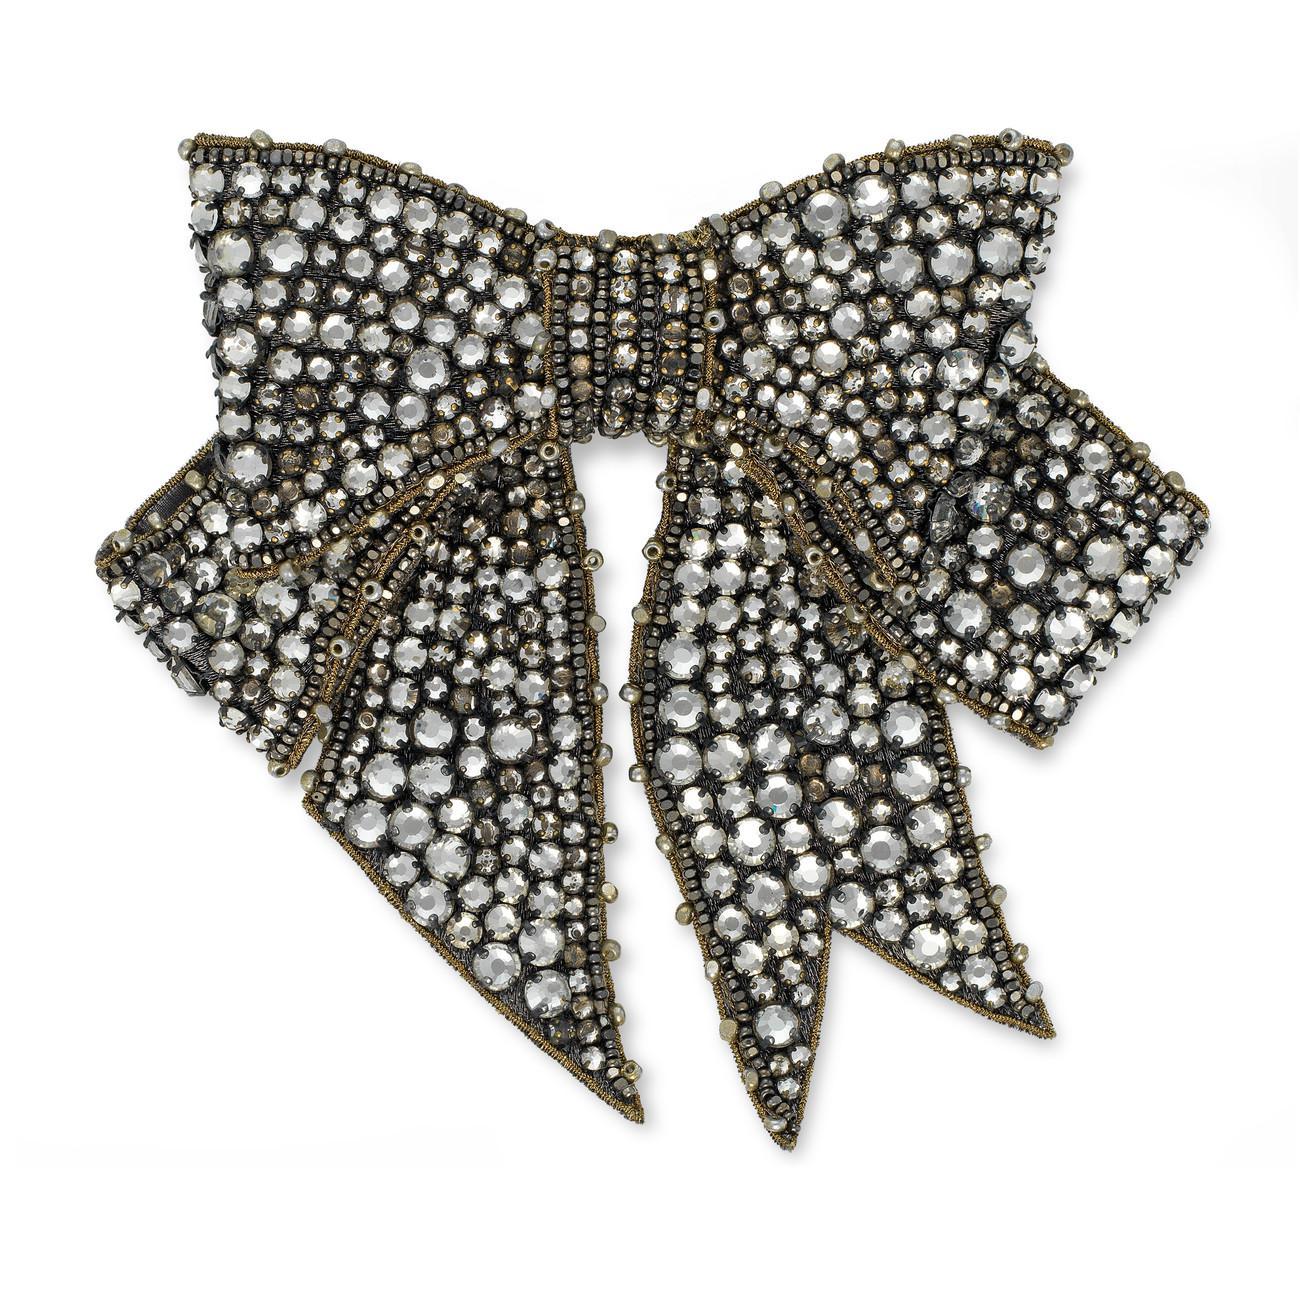 eec16b6964e Lyst - Gucci Crystal Bow Brooch in Gray